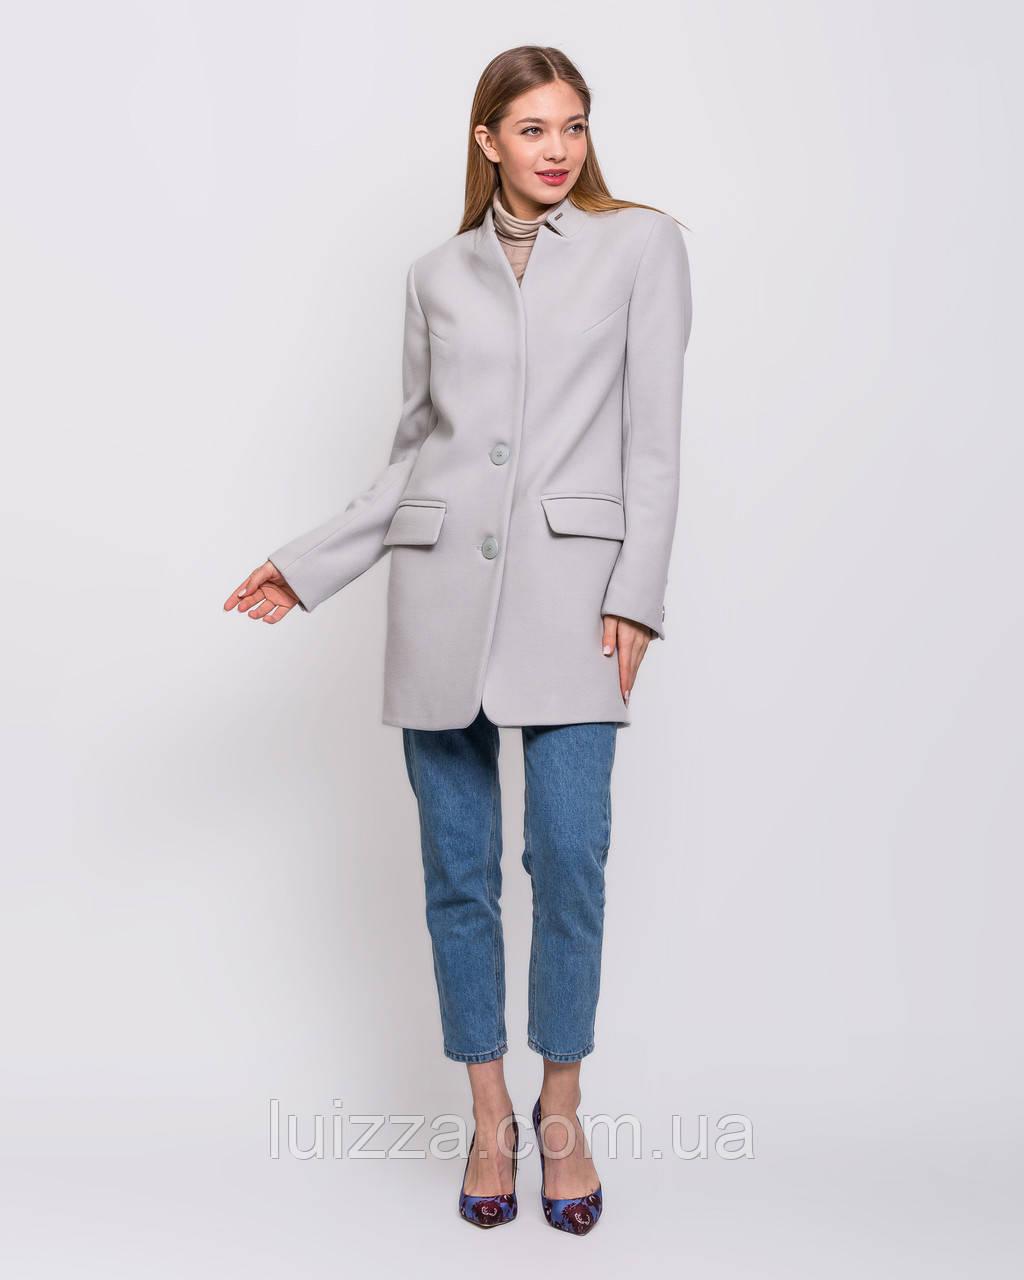 Пальто пиджак  40 42 44 46 48 р светло- серый